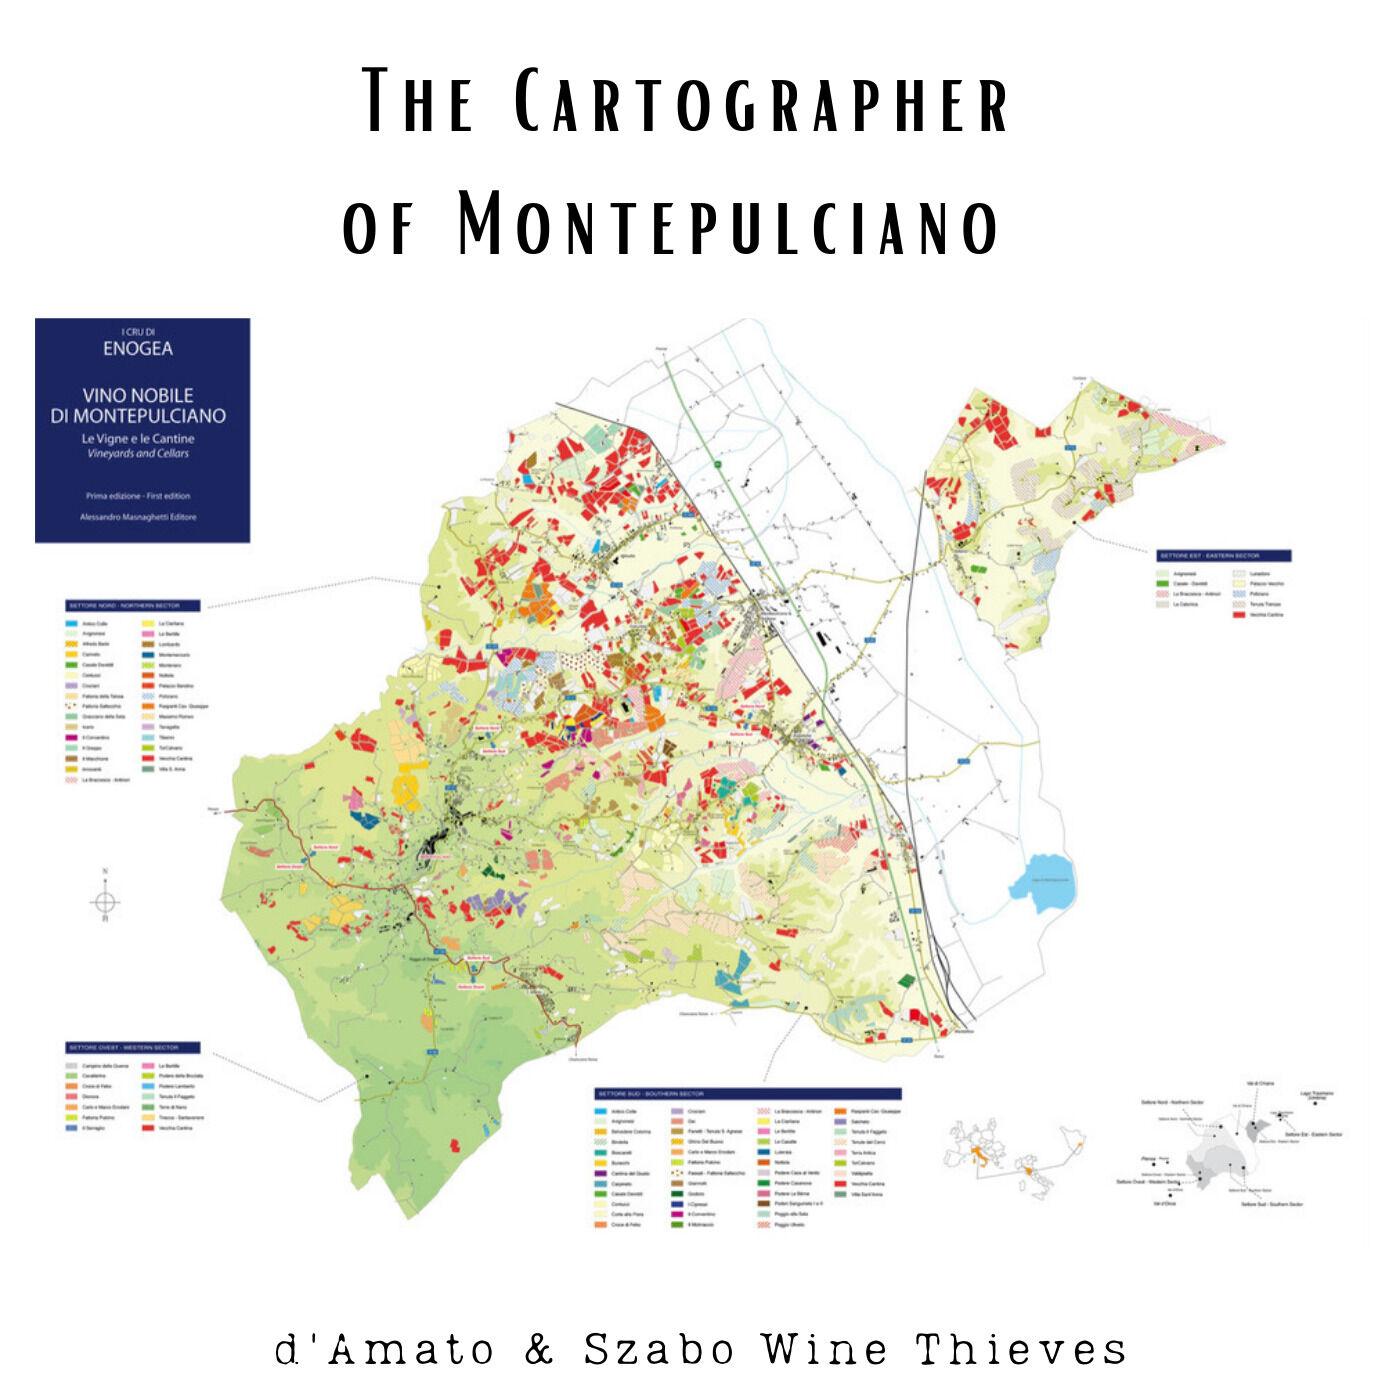 The Cartographer of Montepulciano